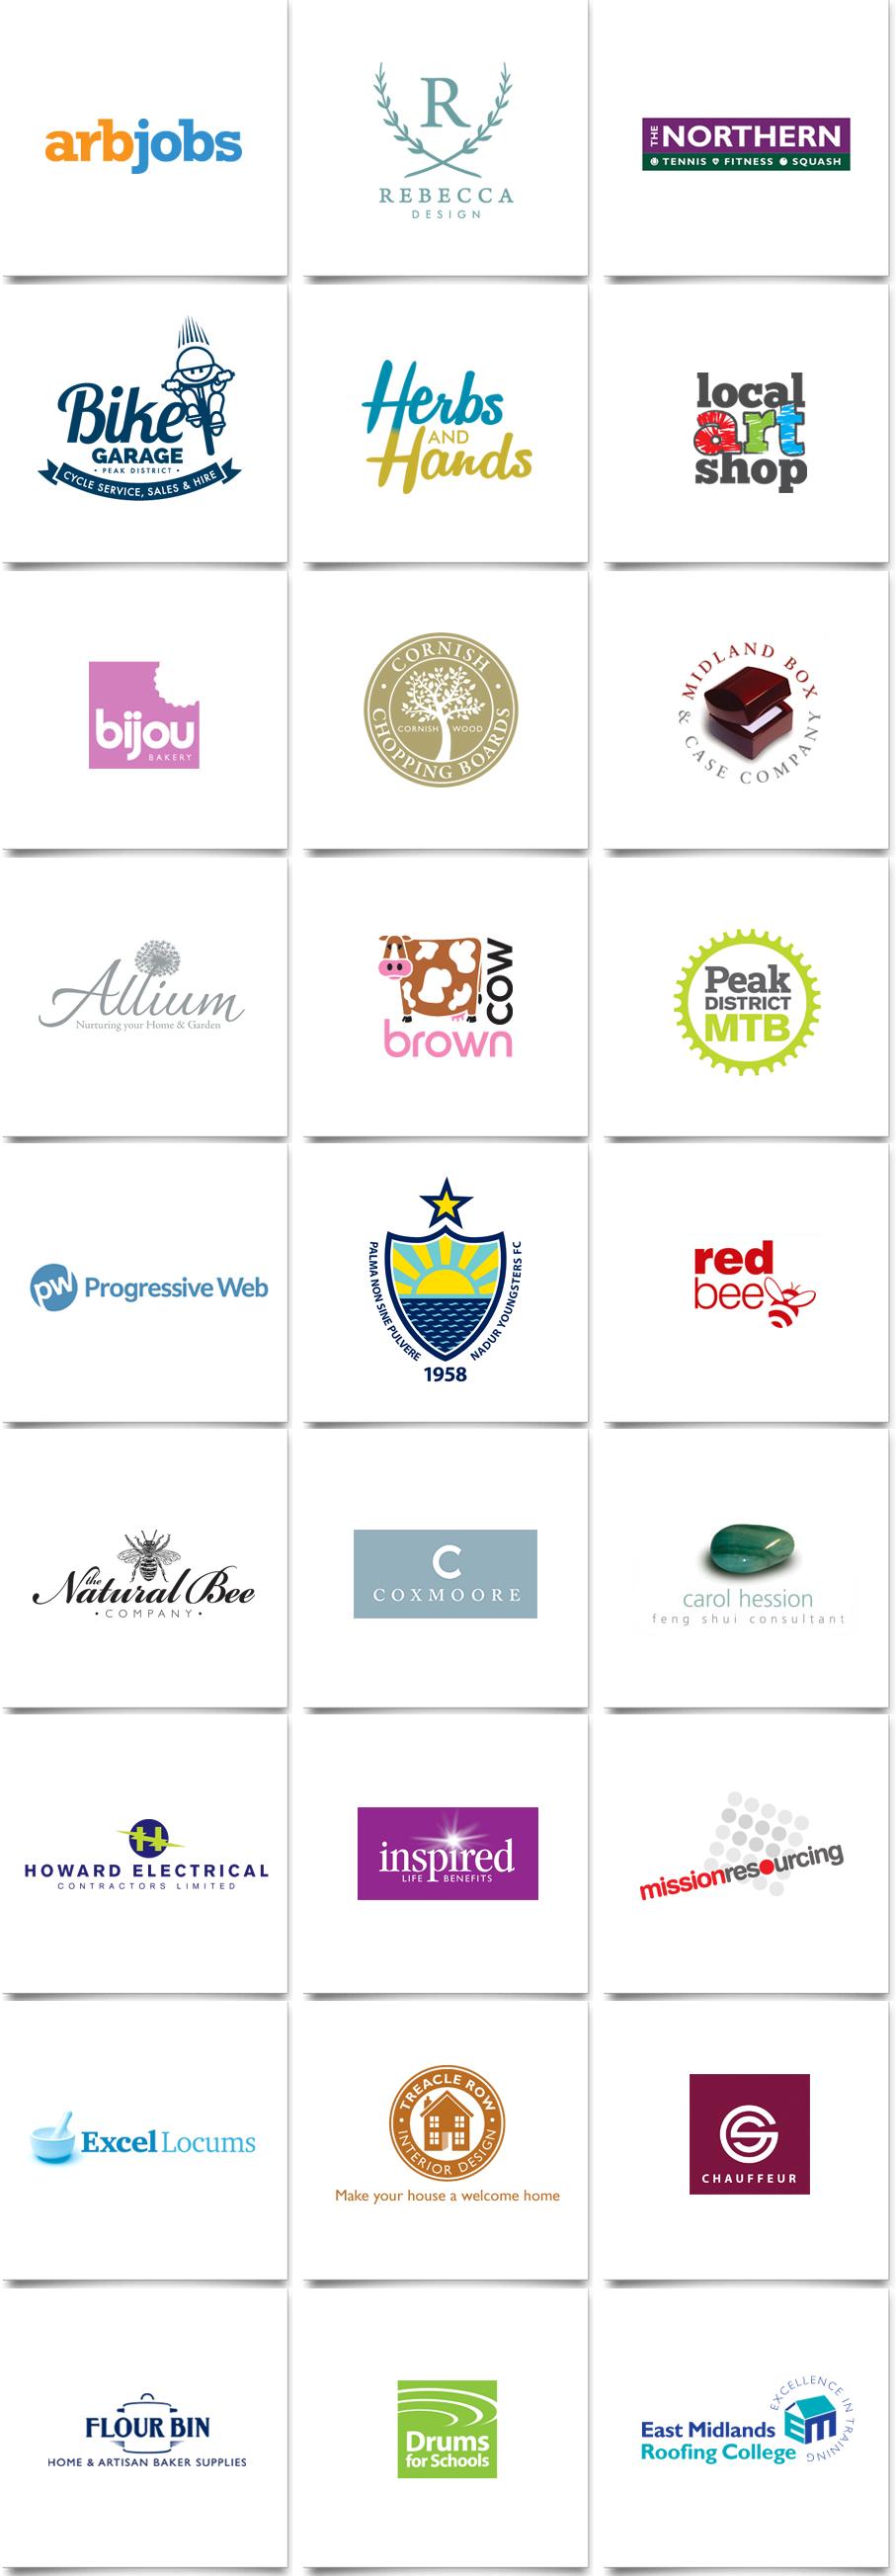 logo design bakewell, hope valley logo design, logo designers peak district, logos hathersage, logo designer tideswell, monyash logo design, logo experts derbyshire, branding peak district,